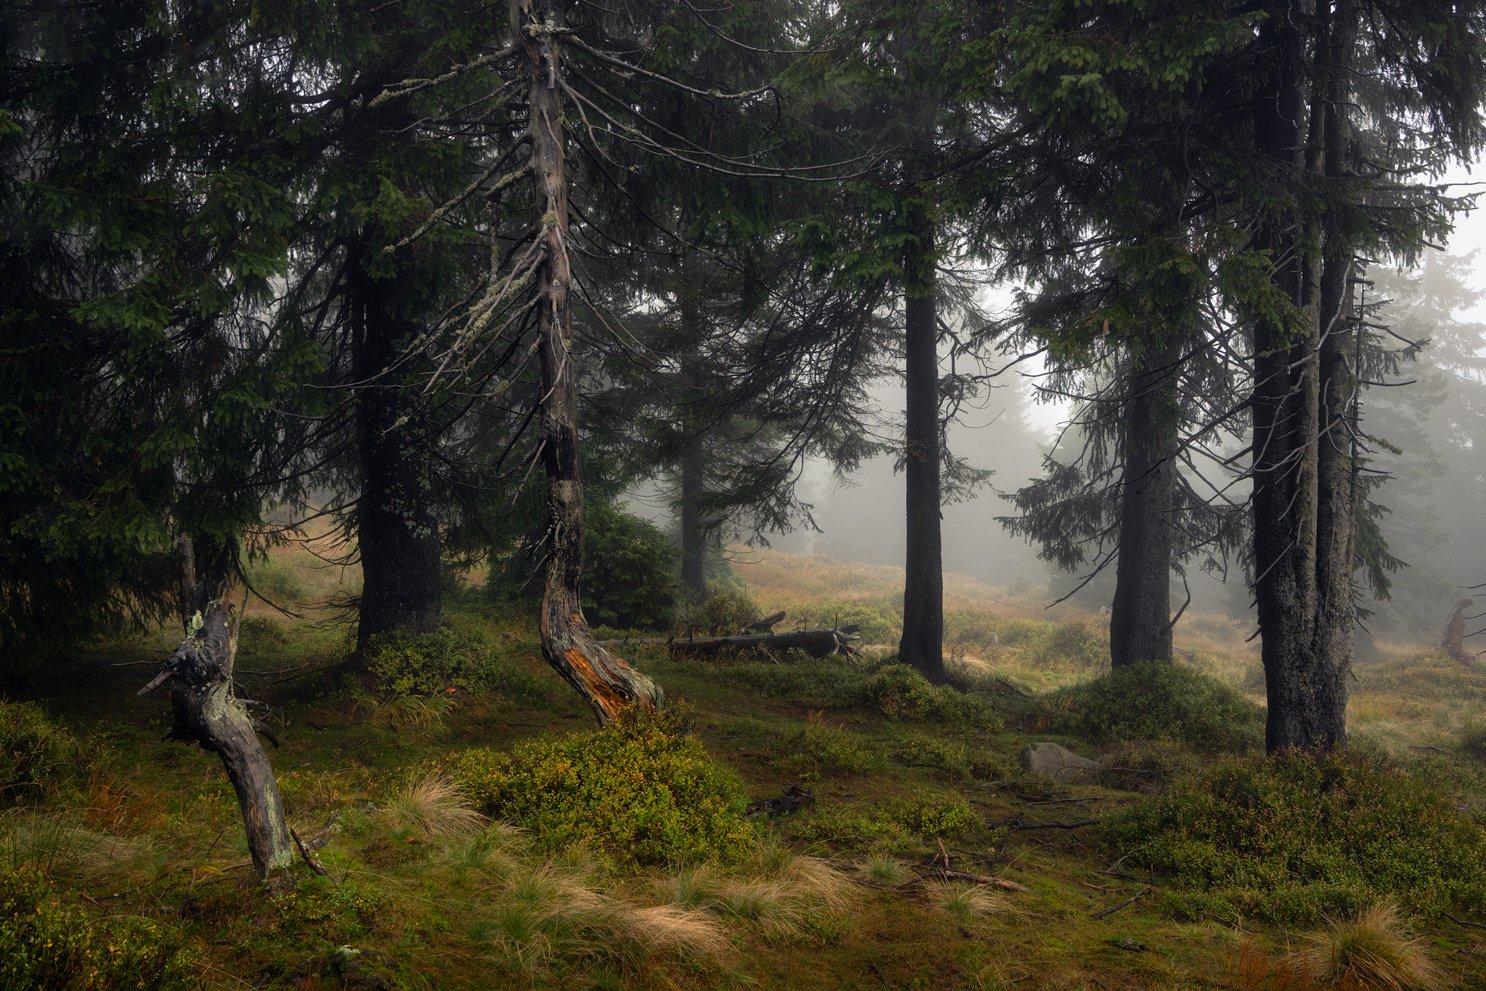 nature, forest, autumn, landscape, colors, morning, foggy, природа, лес, осень, пейзаж, цвета, утро, туман,, Imiełowski Grzegorz